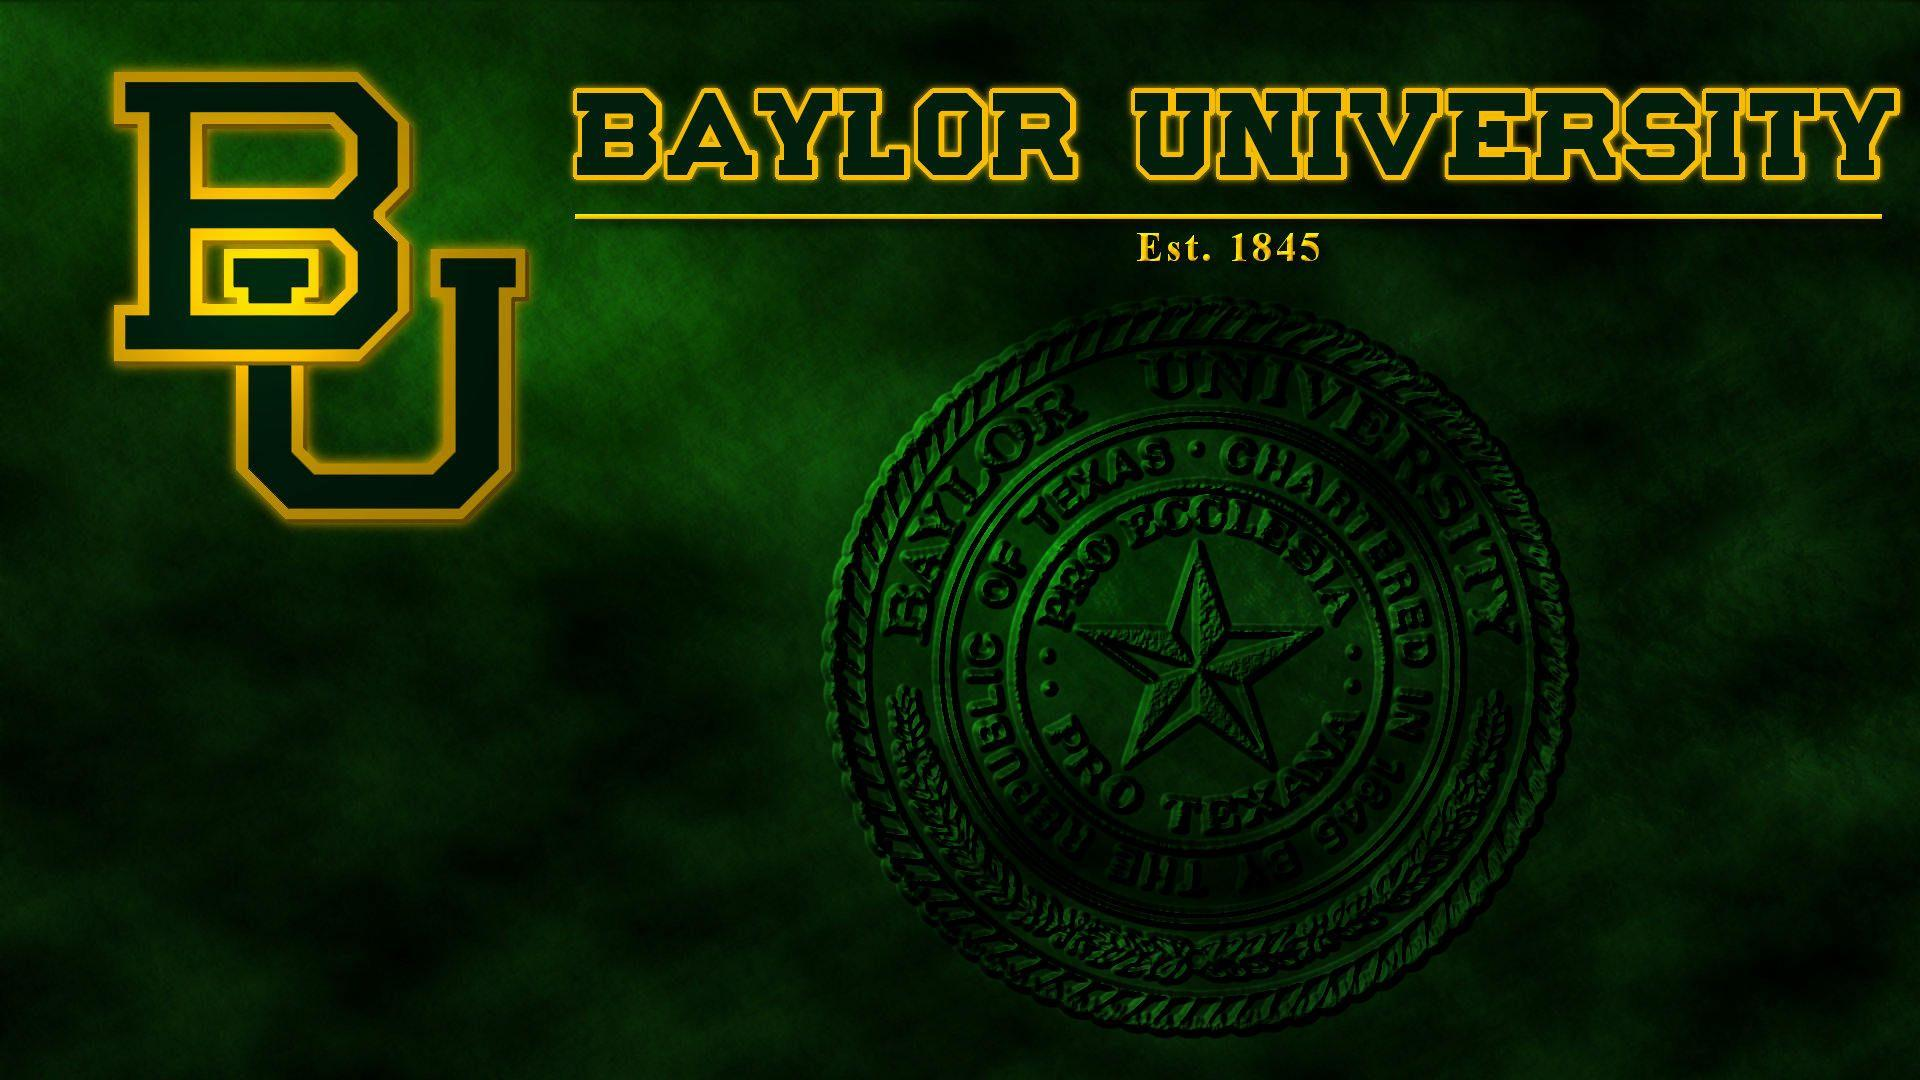 Baylor University Wallpapers 1920x1080